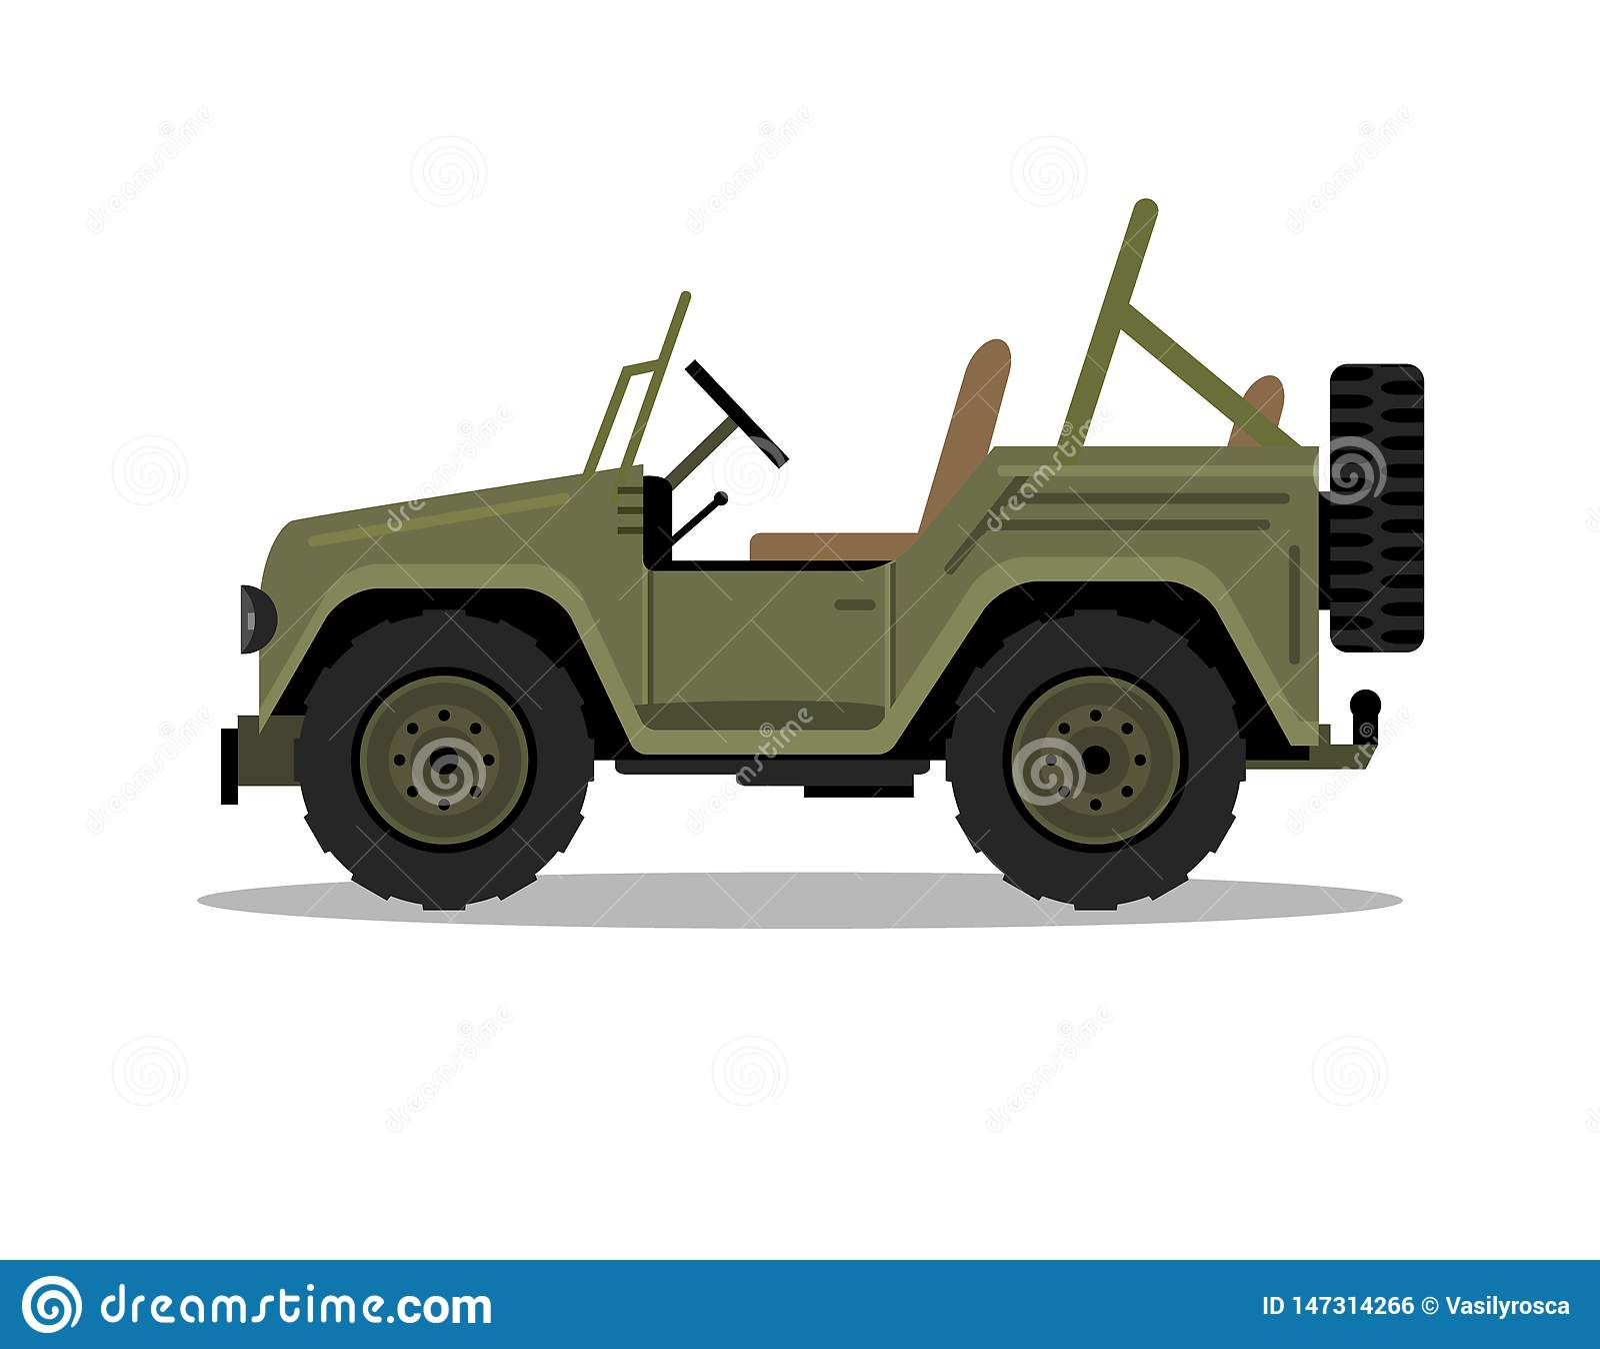 Safari Jeep Cartoon Stock Illustrations 296 Safari Jeep Cartoon Stock Illustrations Vectors Clipart Dreamstime